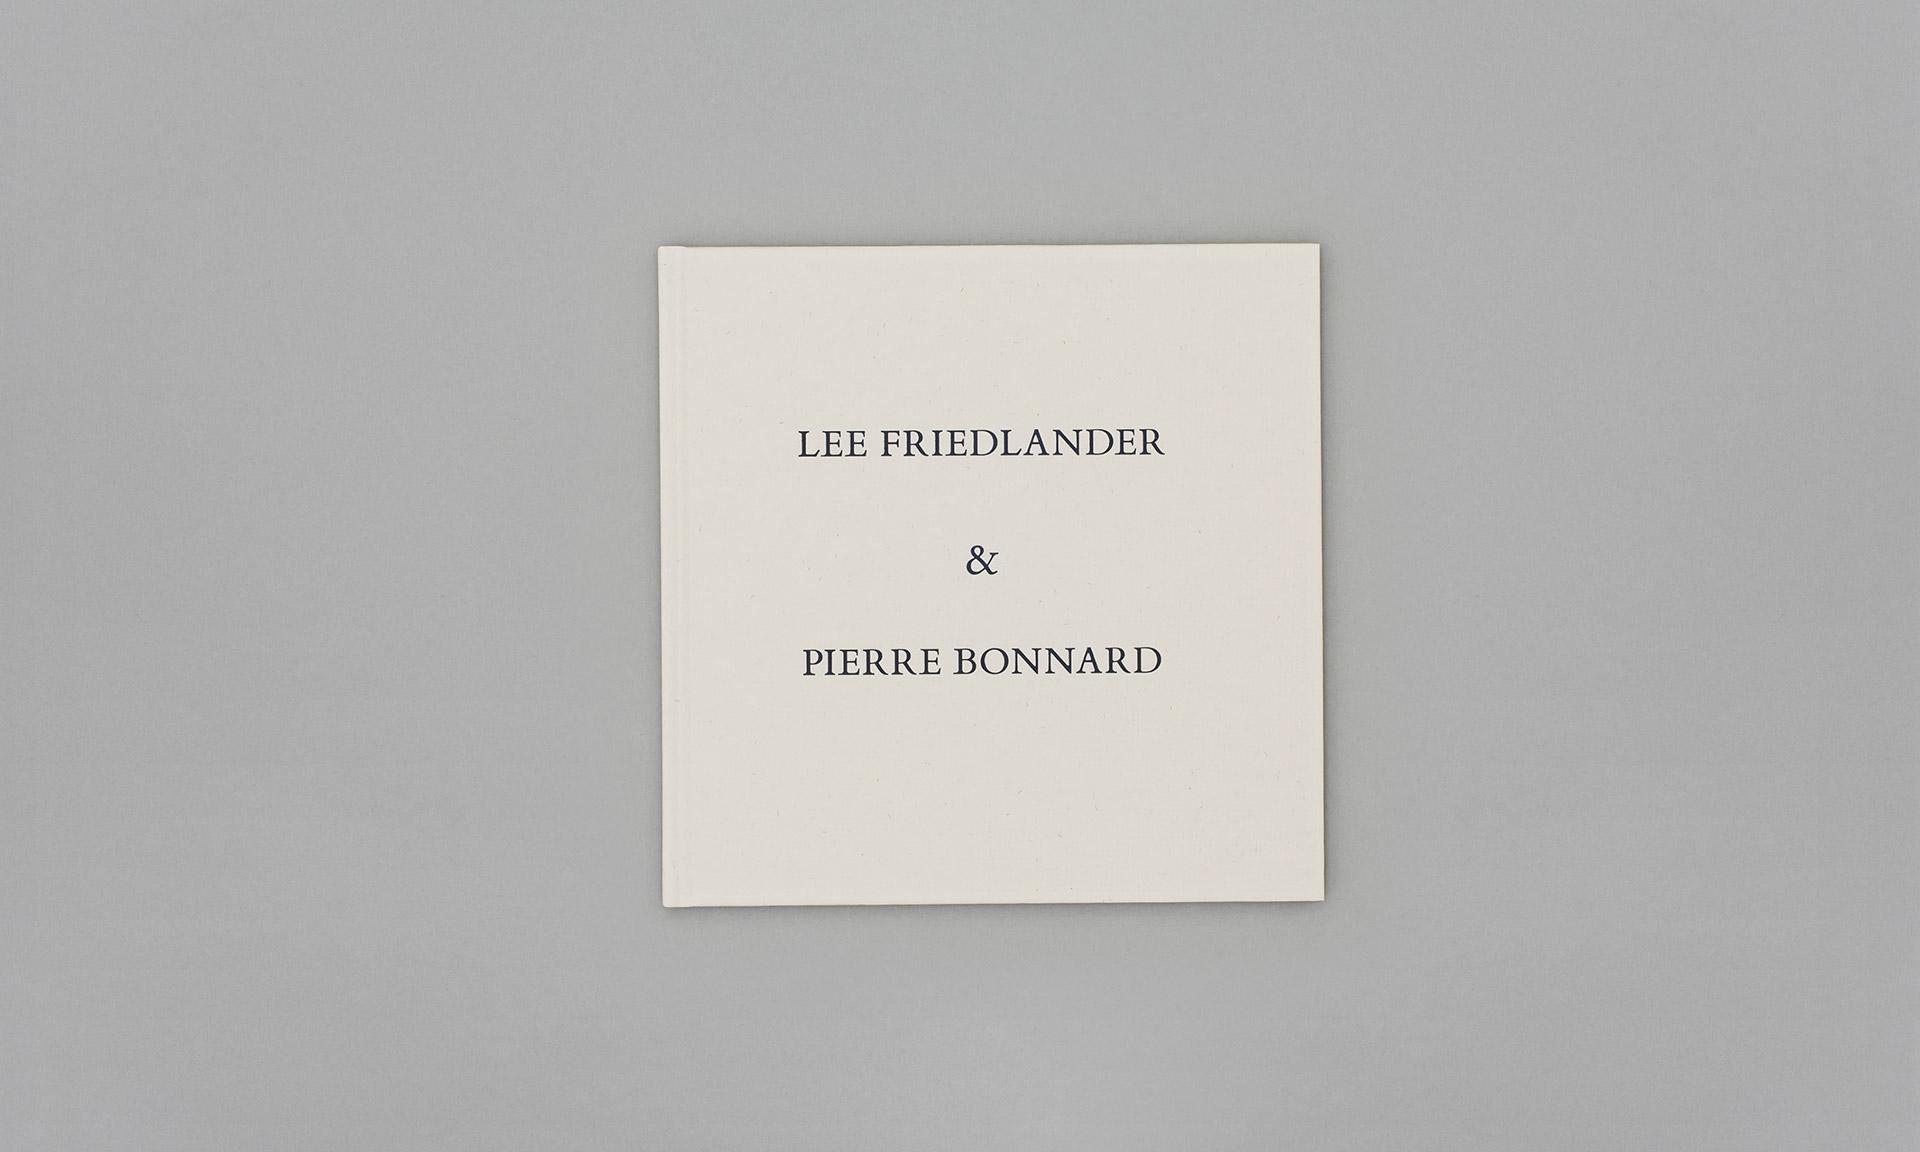 Friedlander_Bonnard_06